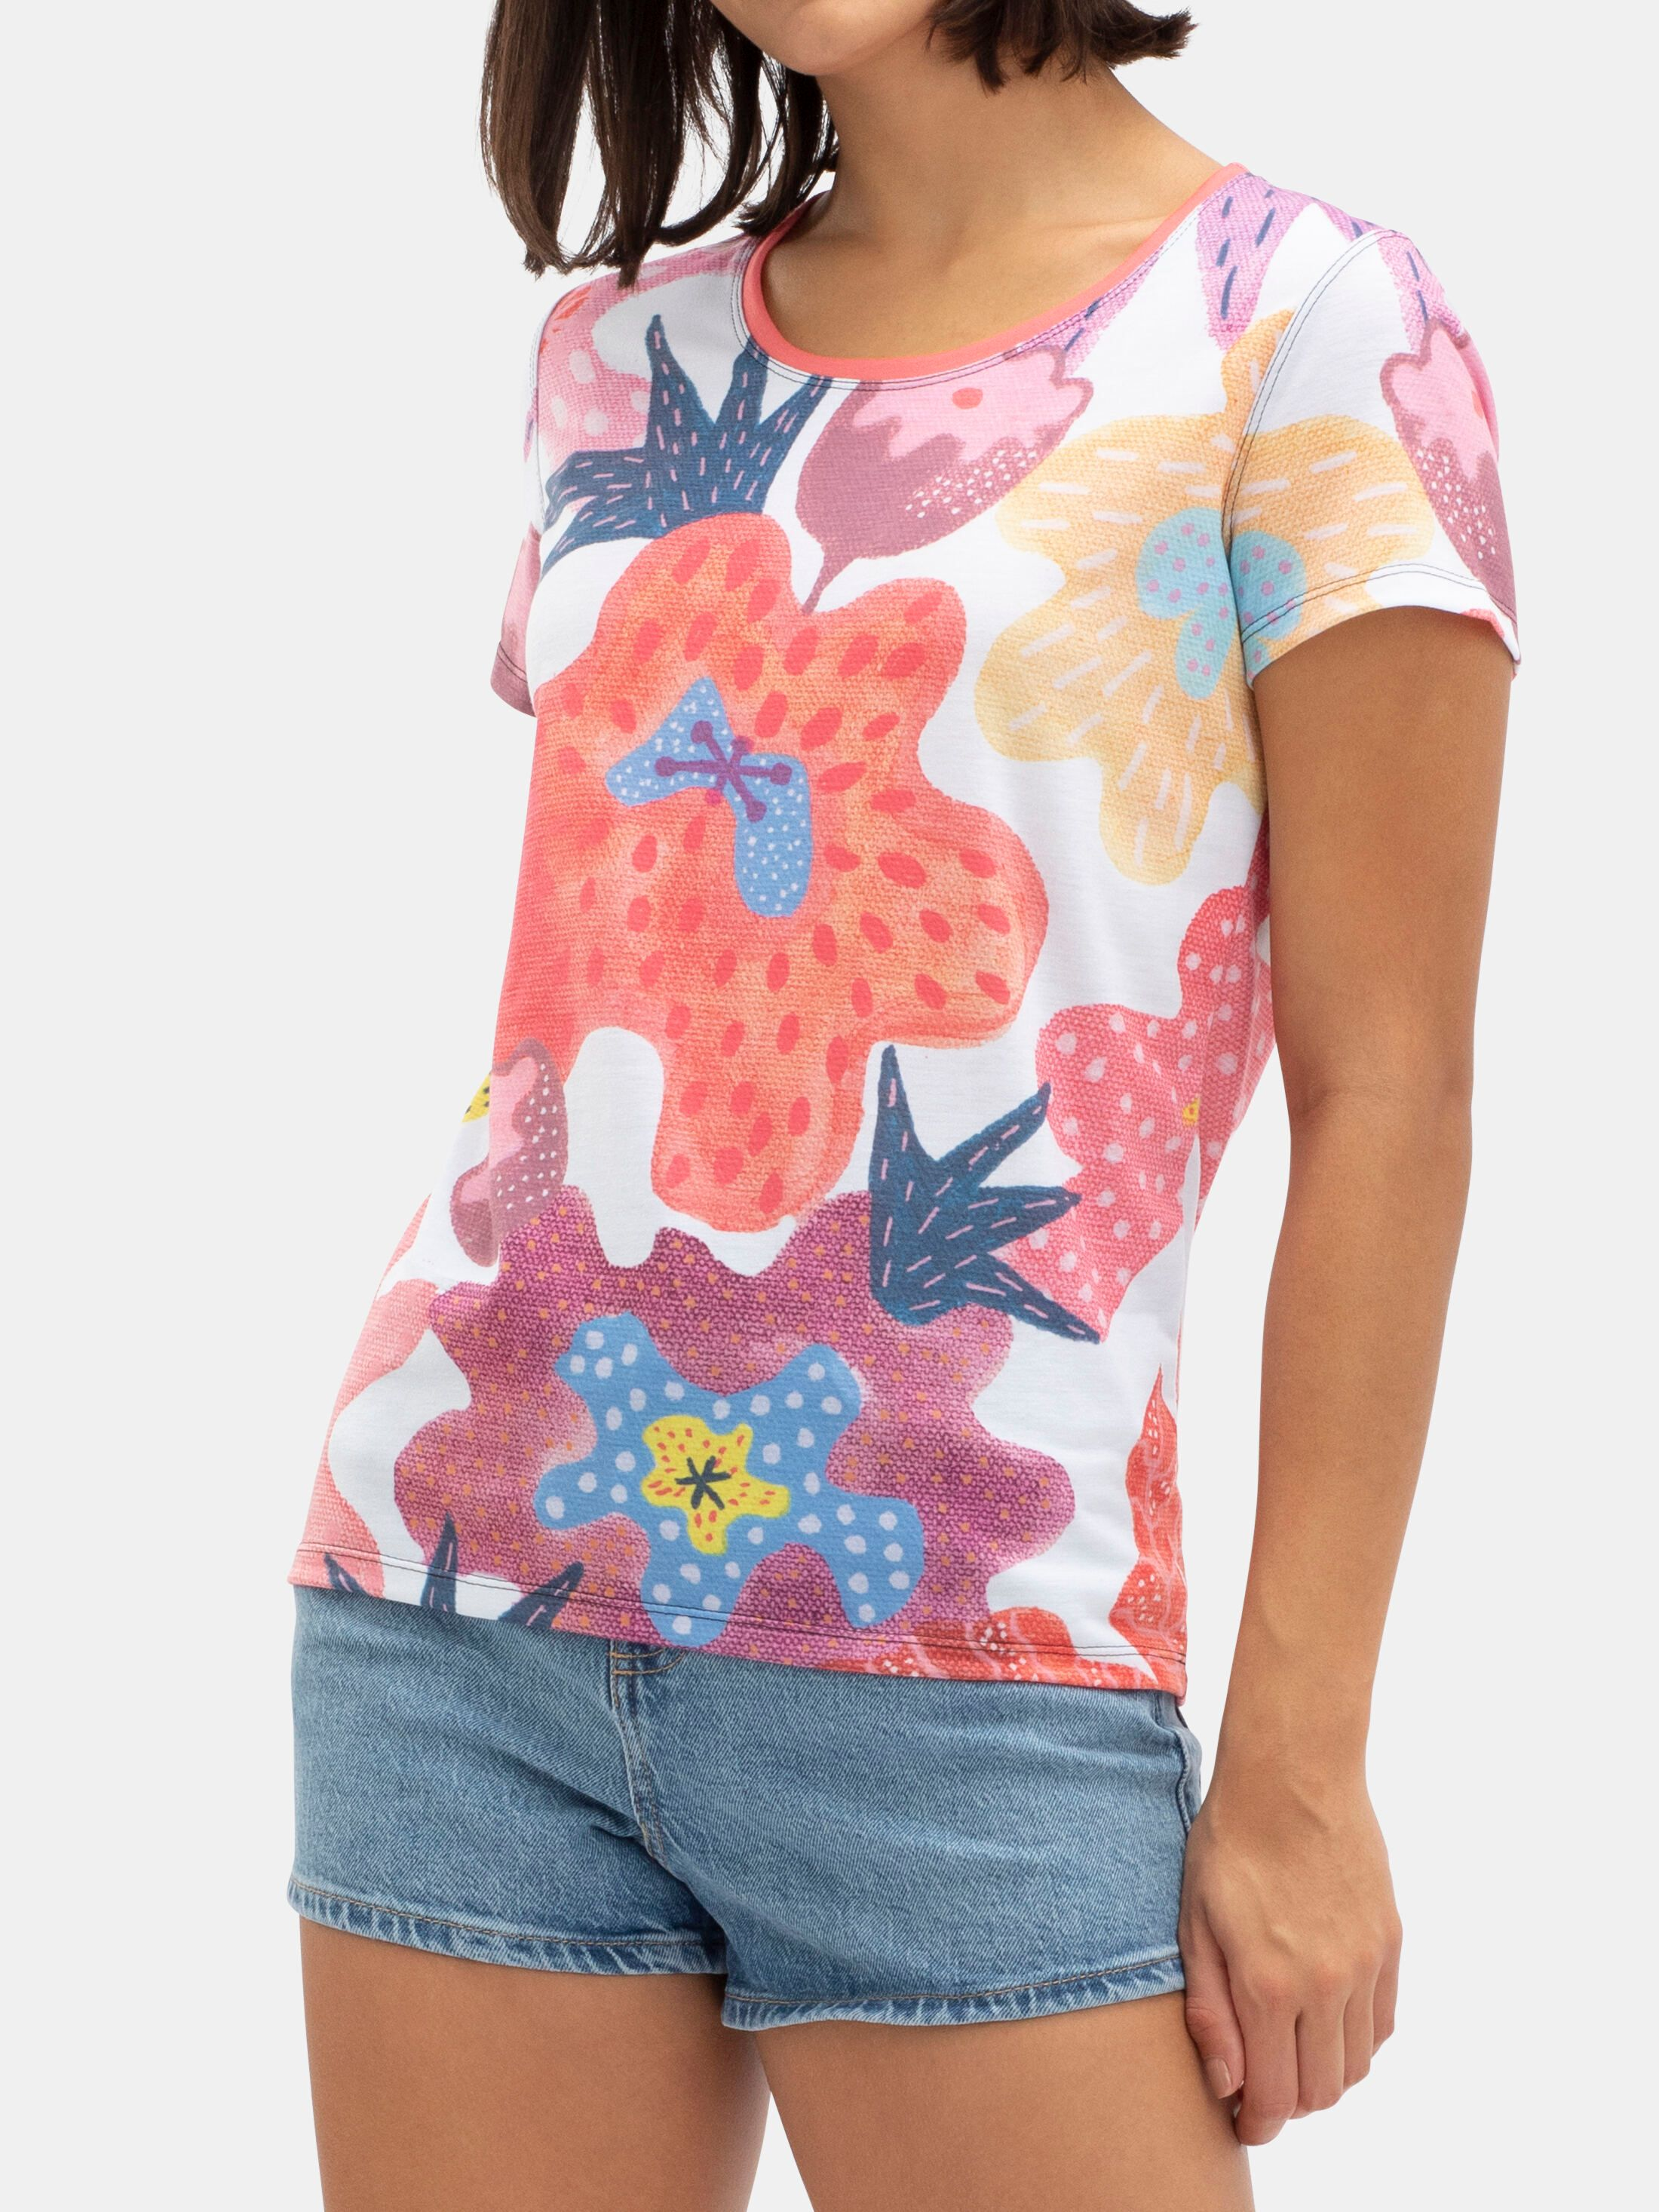 Women's Custom T-Shirt